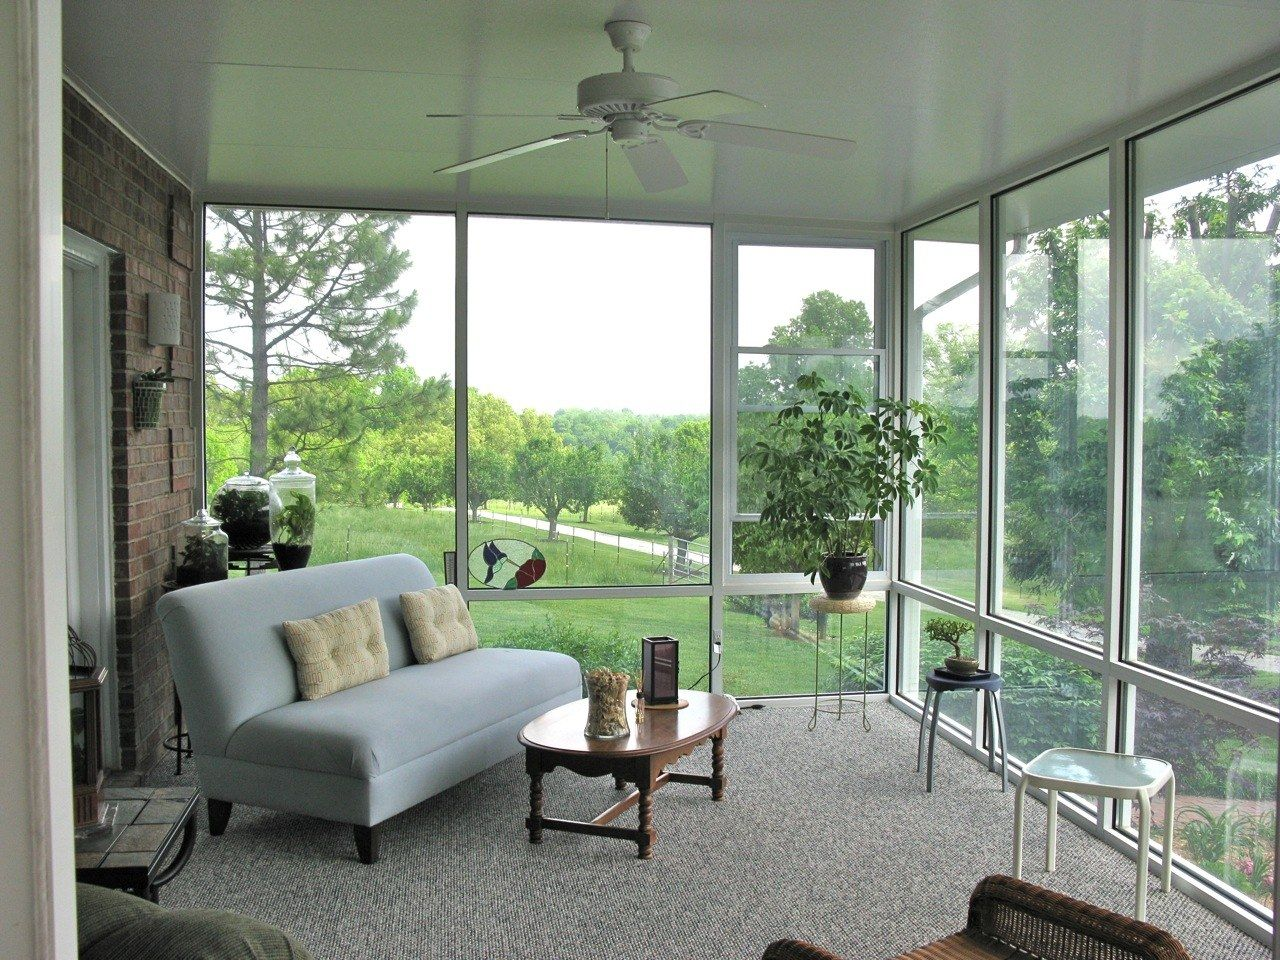 Ideas for enclosing our patio   Patio enclosures, Aluminum ... on Outdoor Patio Enclosure Ideas  id=62038